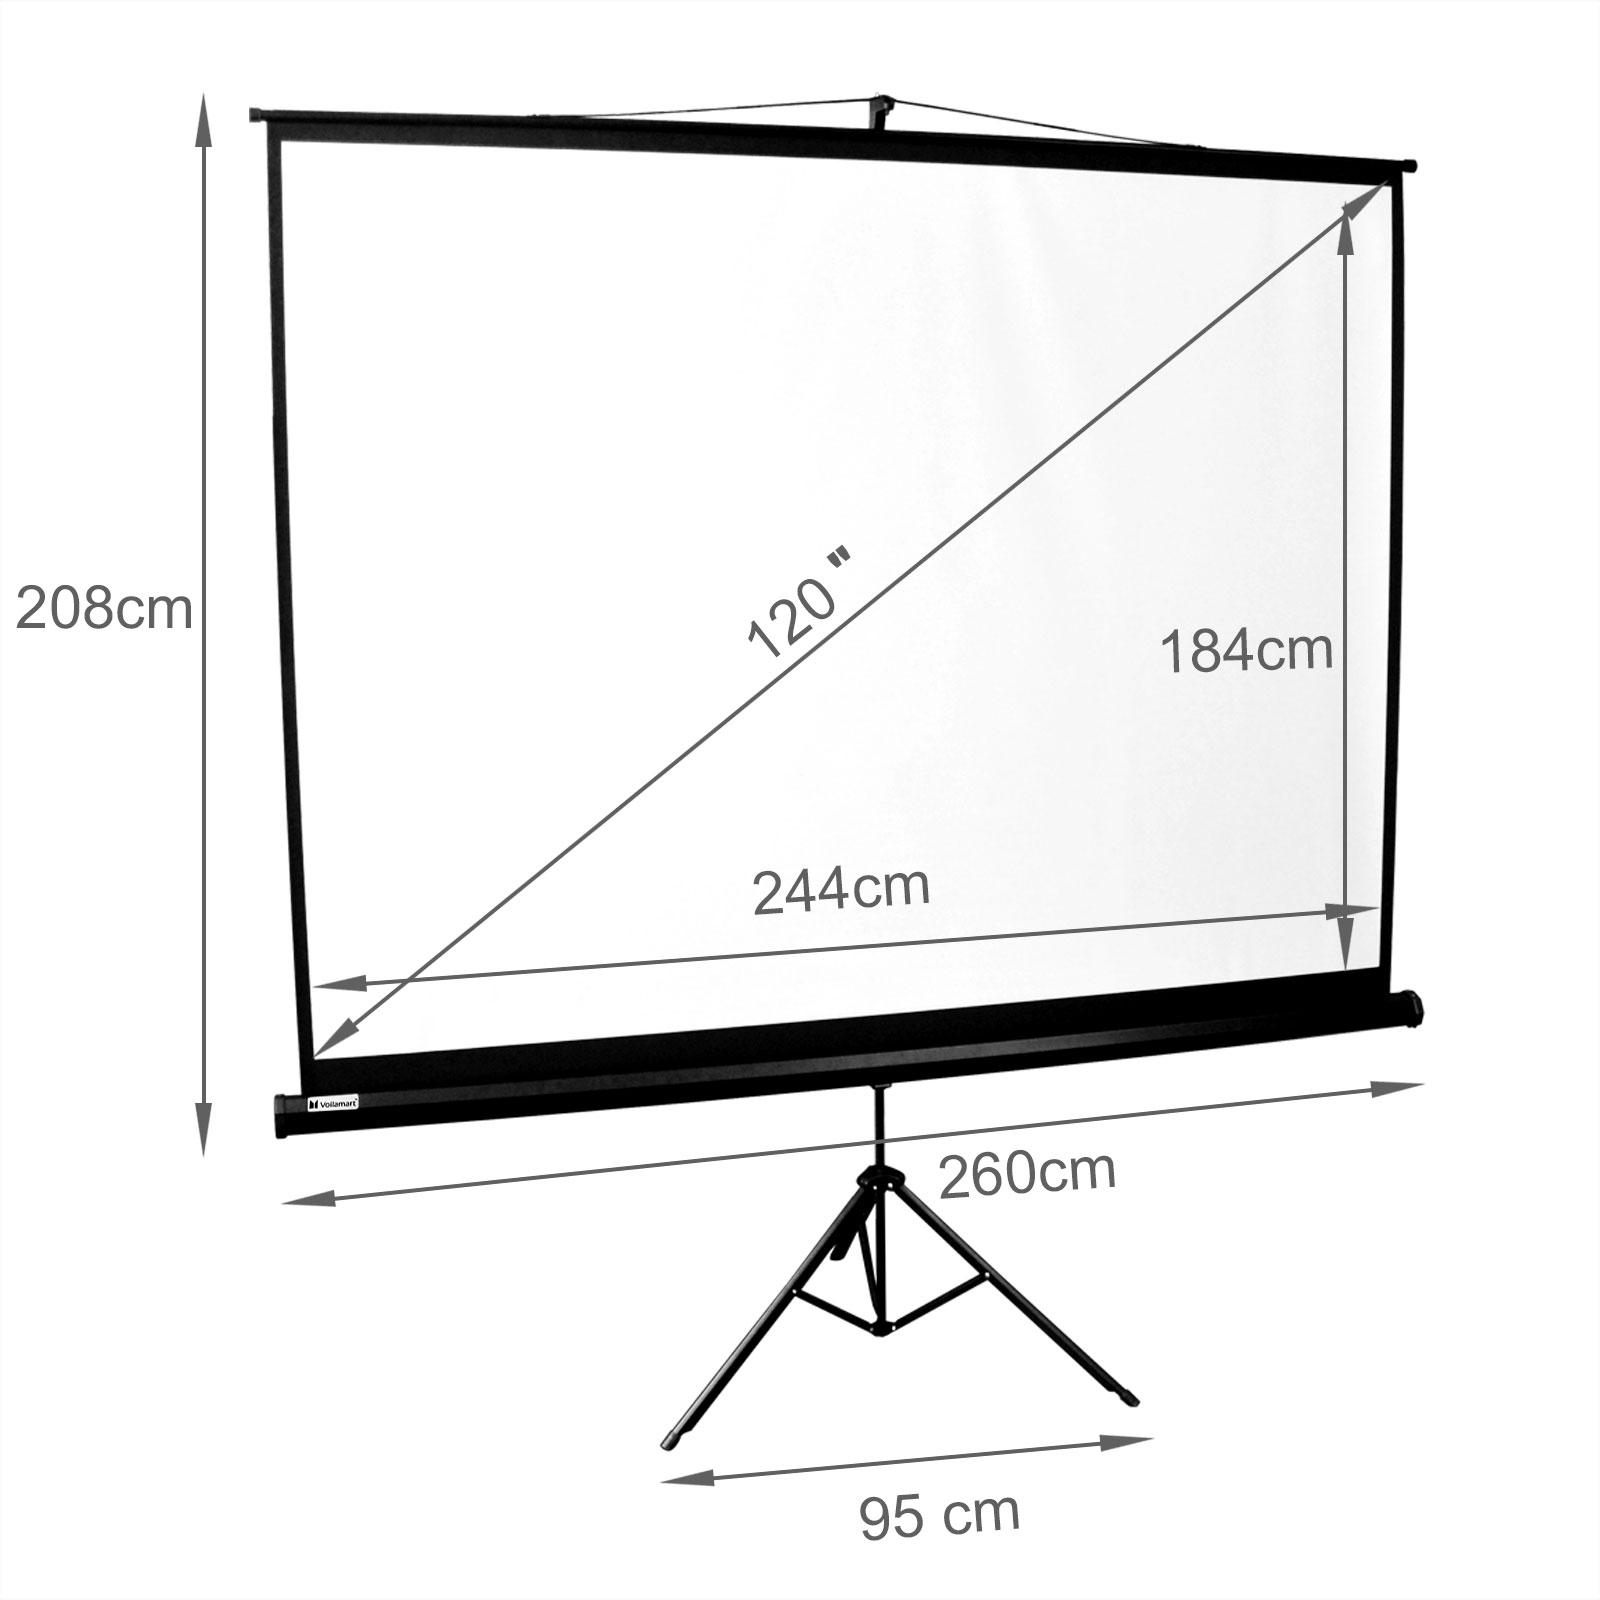 120 u201d inch portable tripod projector screen conference presentation hd projection 611165984205